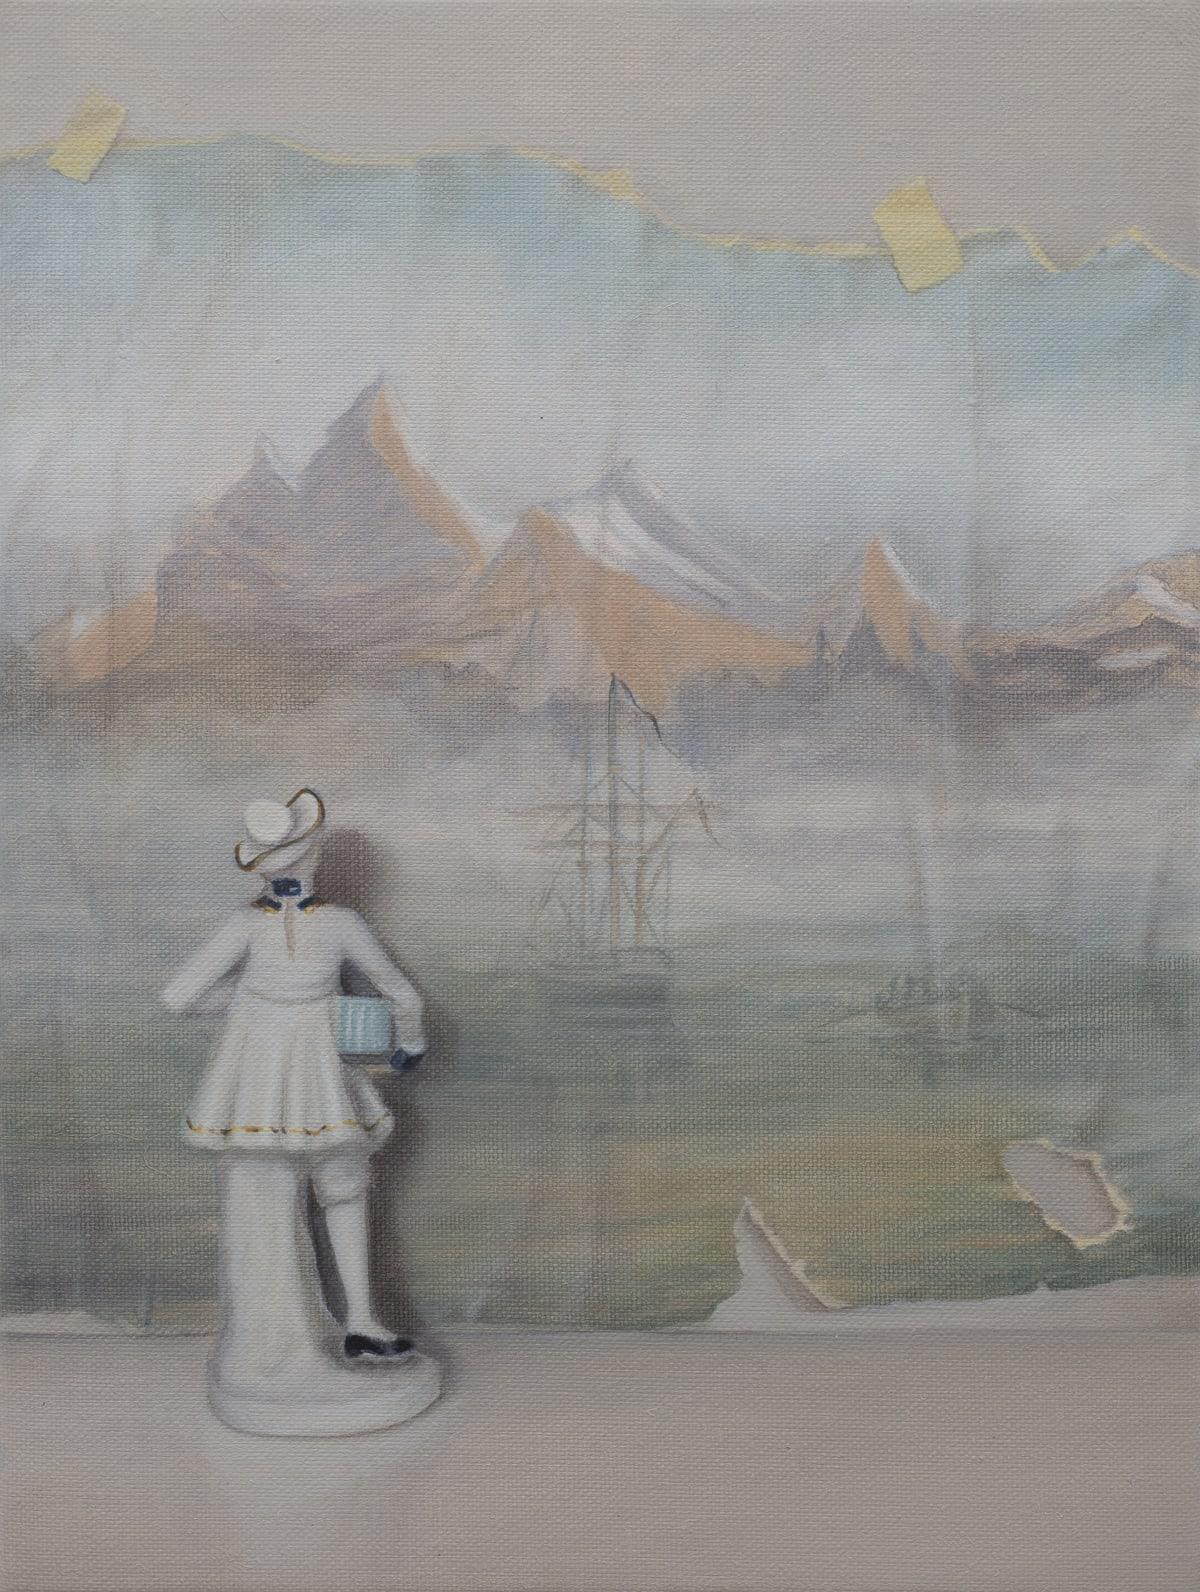 Emily Wolfe Distance III, 2019 395mm x 295mm